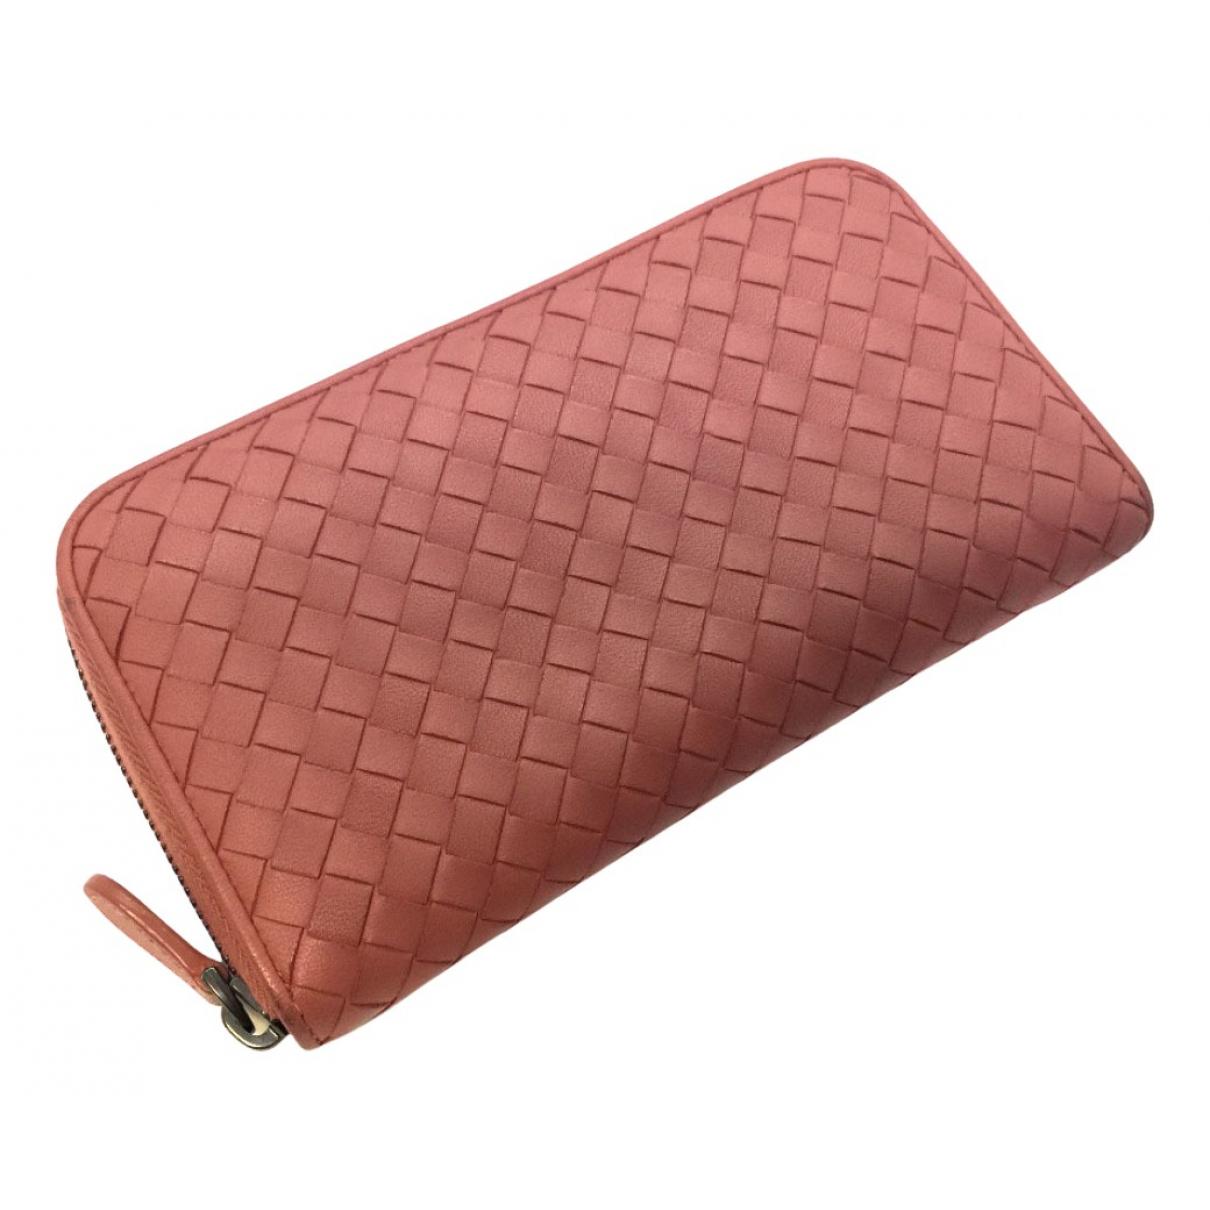 Bottega Veneta Intrecciato Pink Leather wallet for Women N